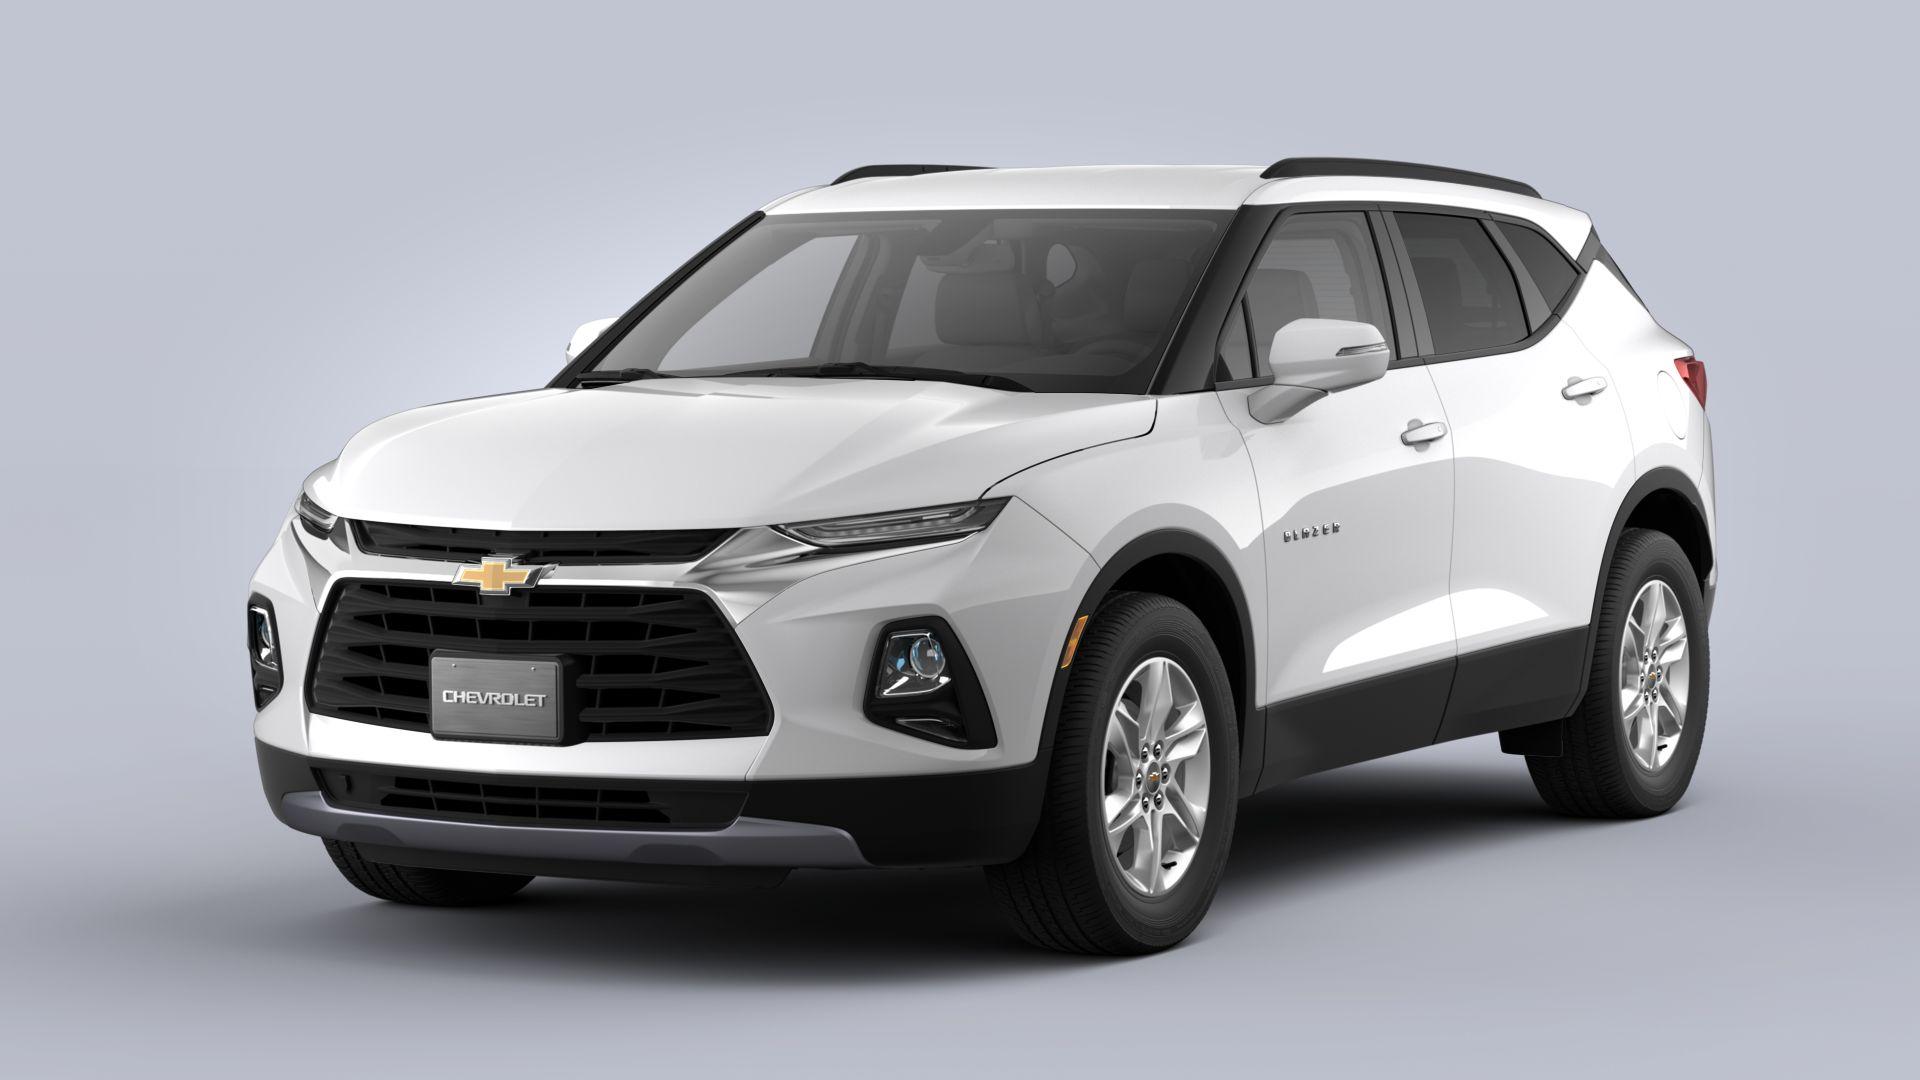 2020 Chevrolet Blazer 2LT Crossover